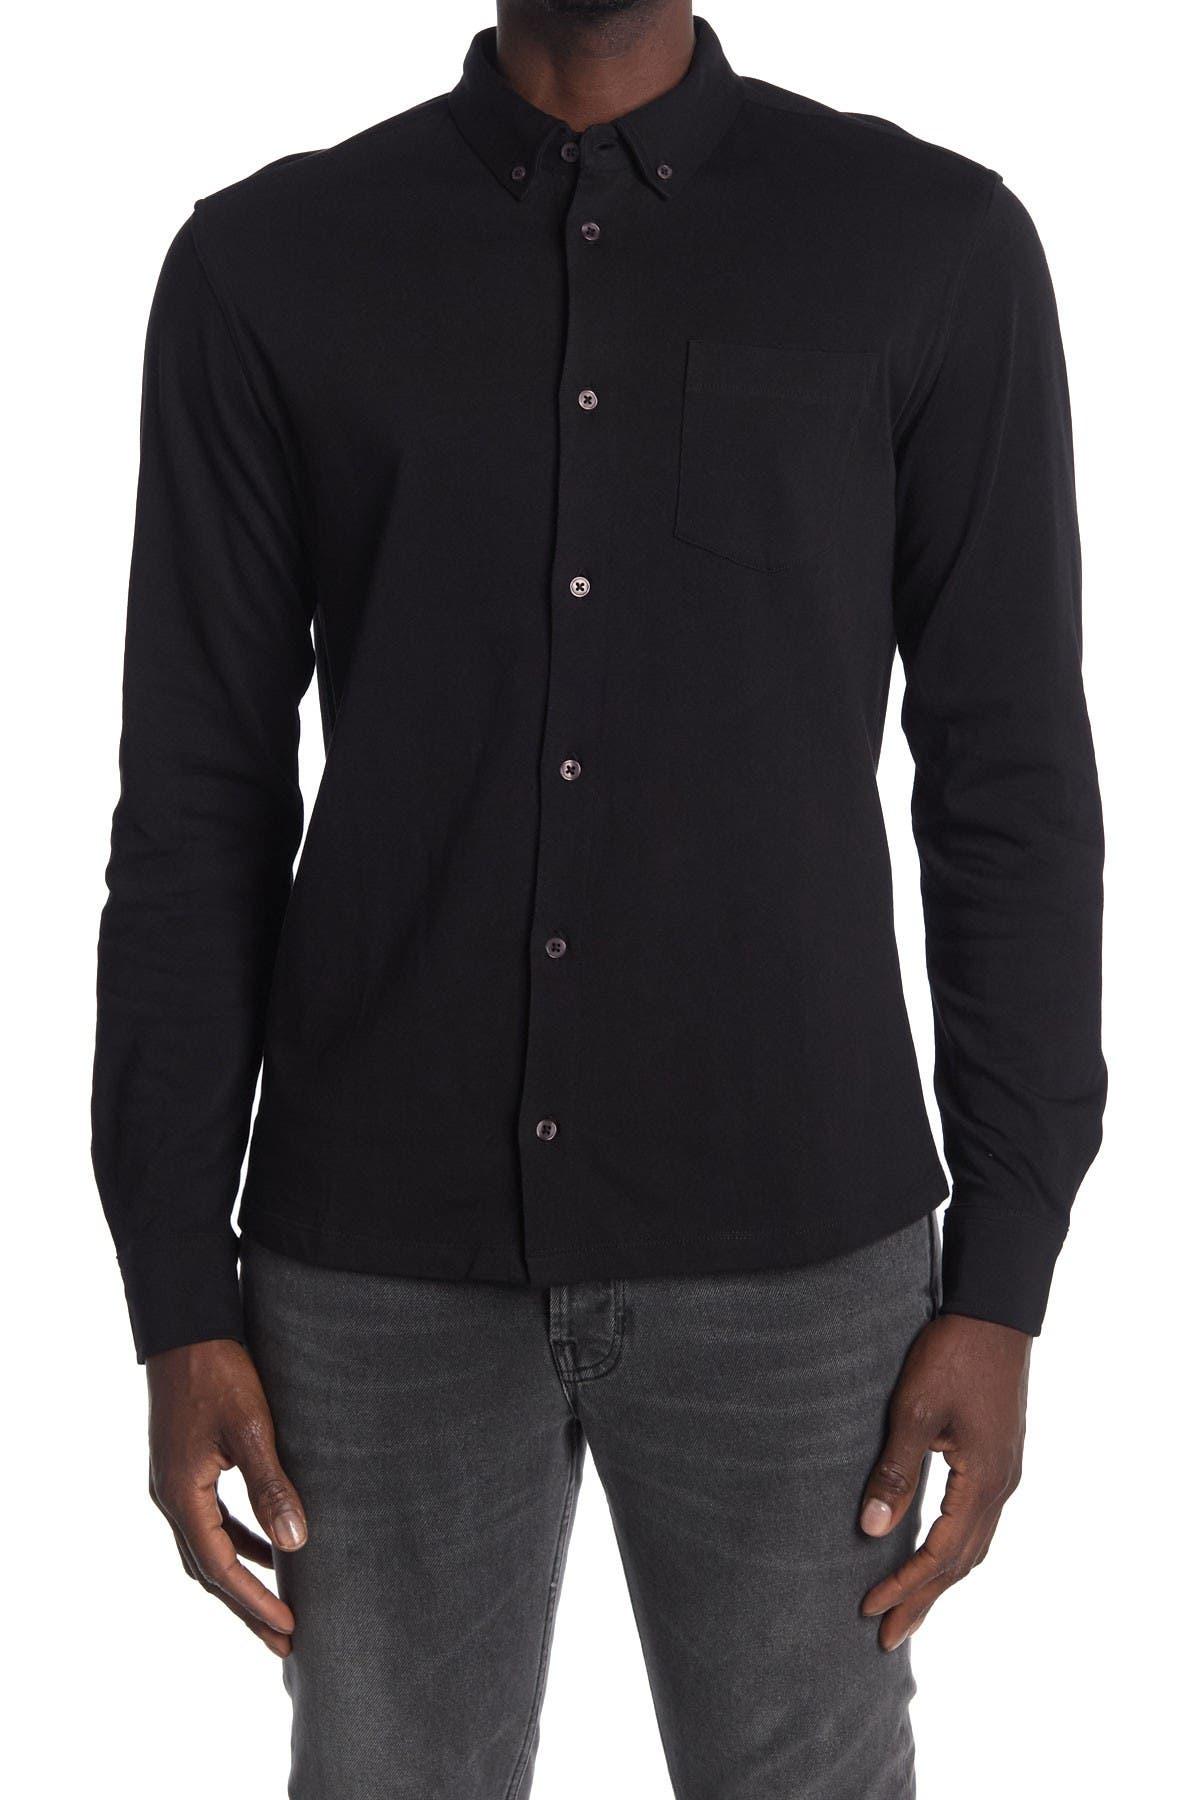 Image of Slate & Stone Solid Shirt